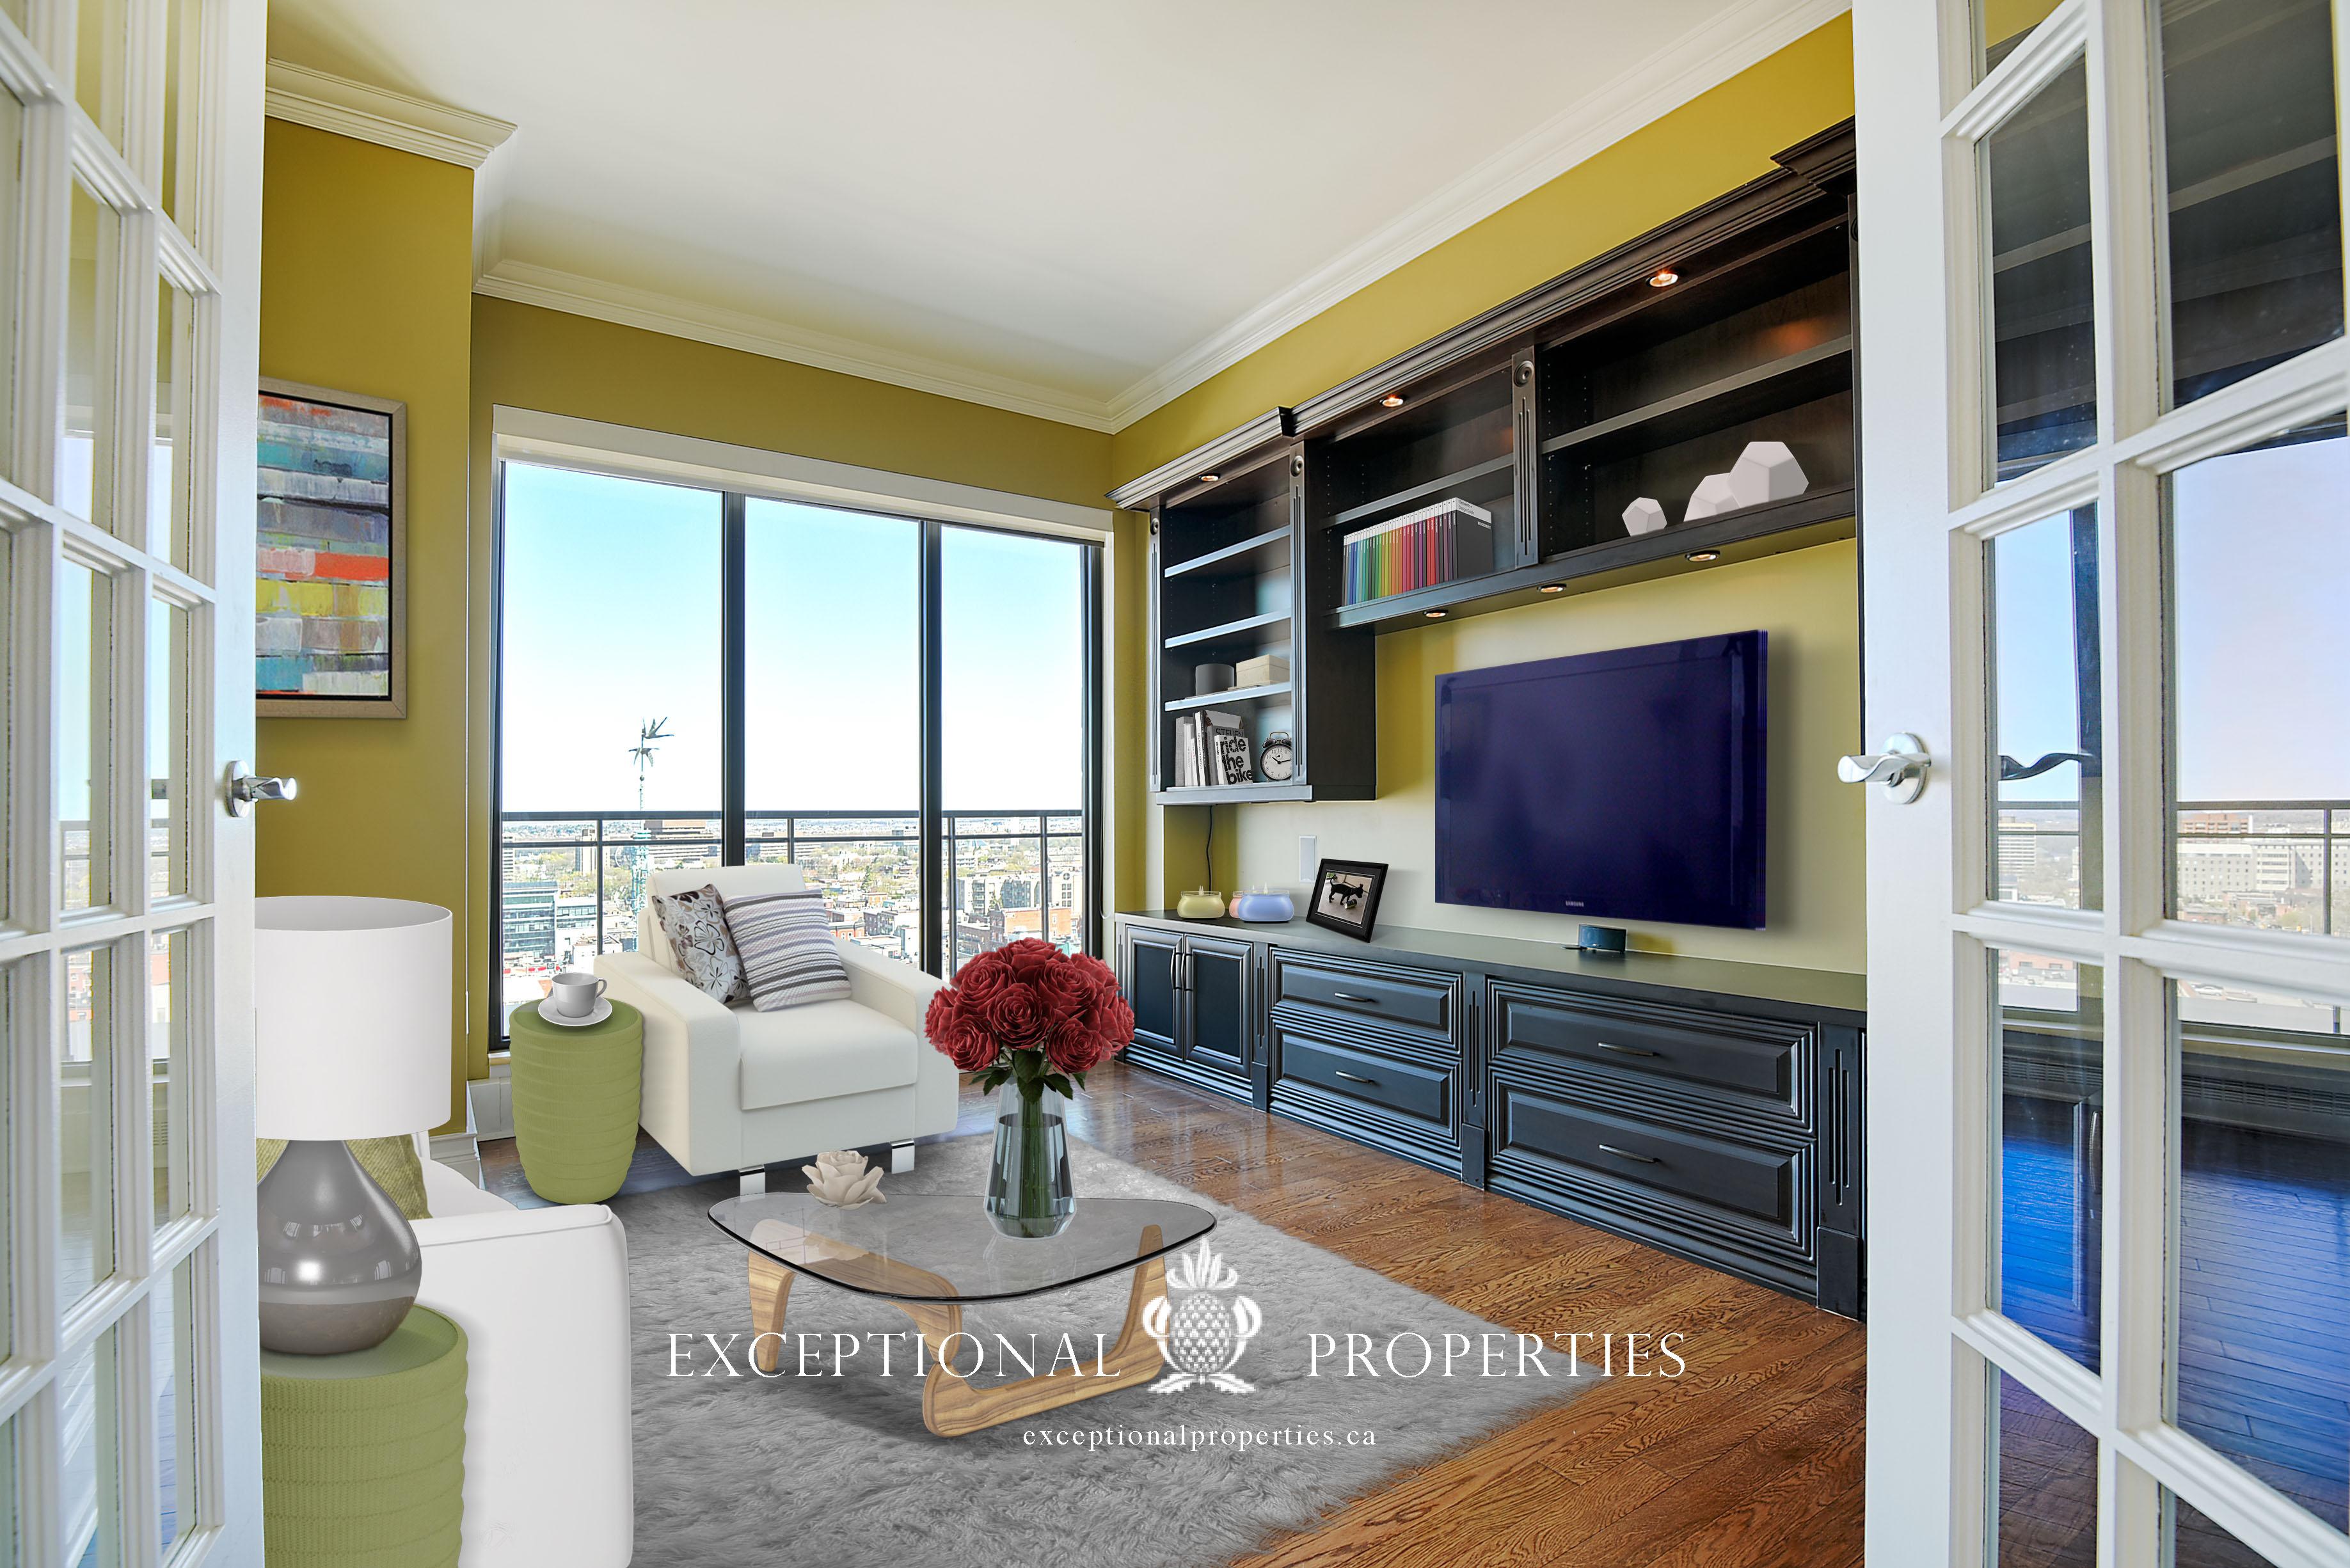 Selling Luxury Lifestyle Properties